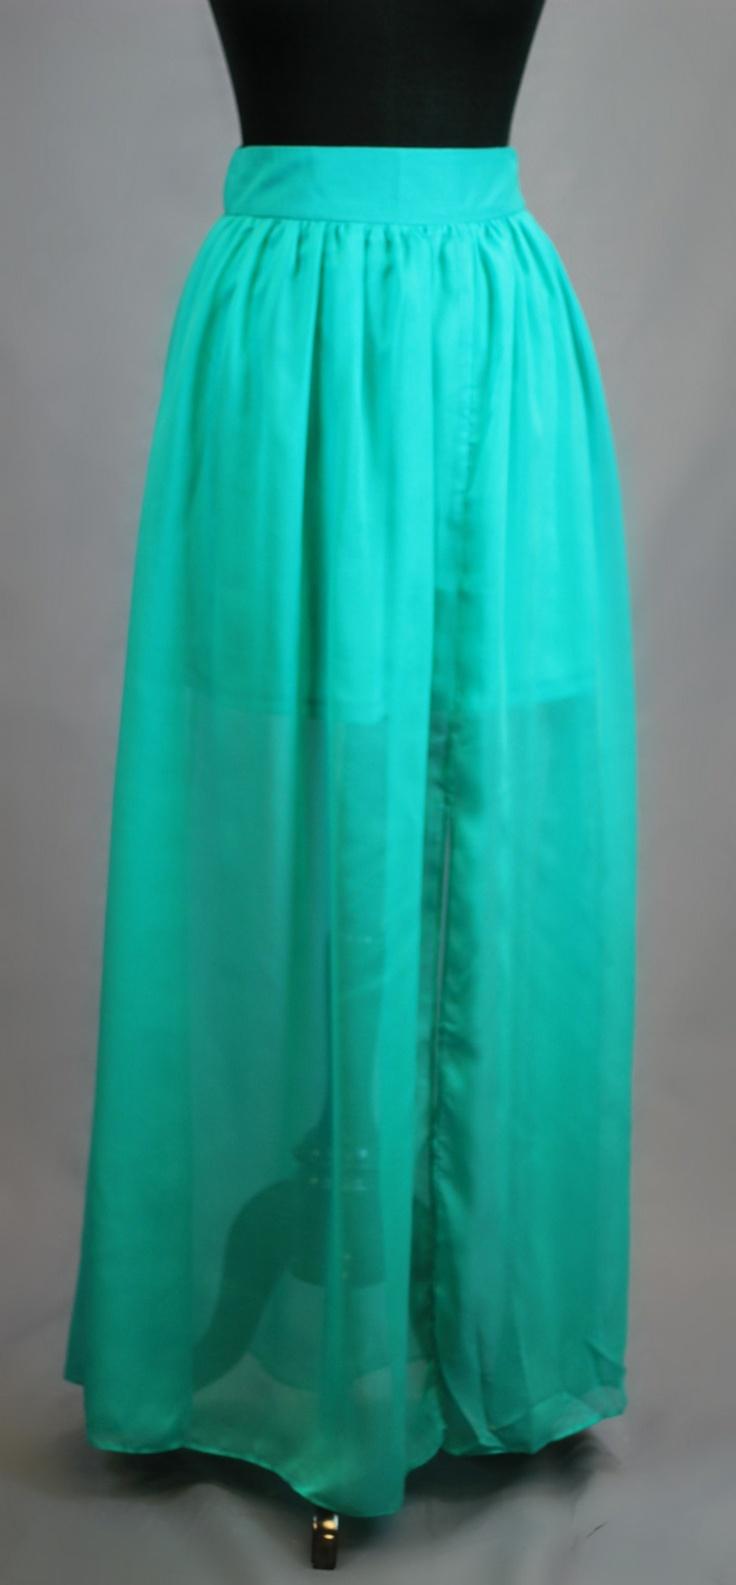 turquoise maxi skirt maxi obsession maxis